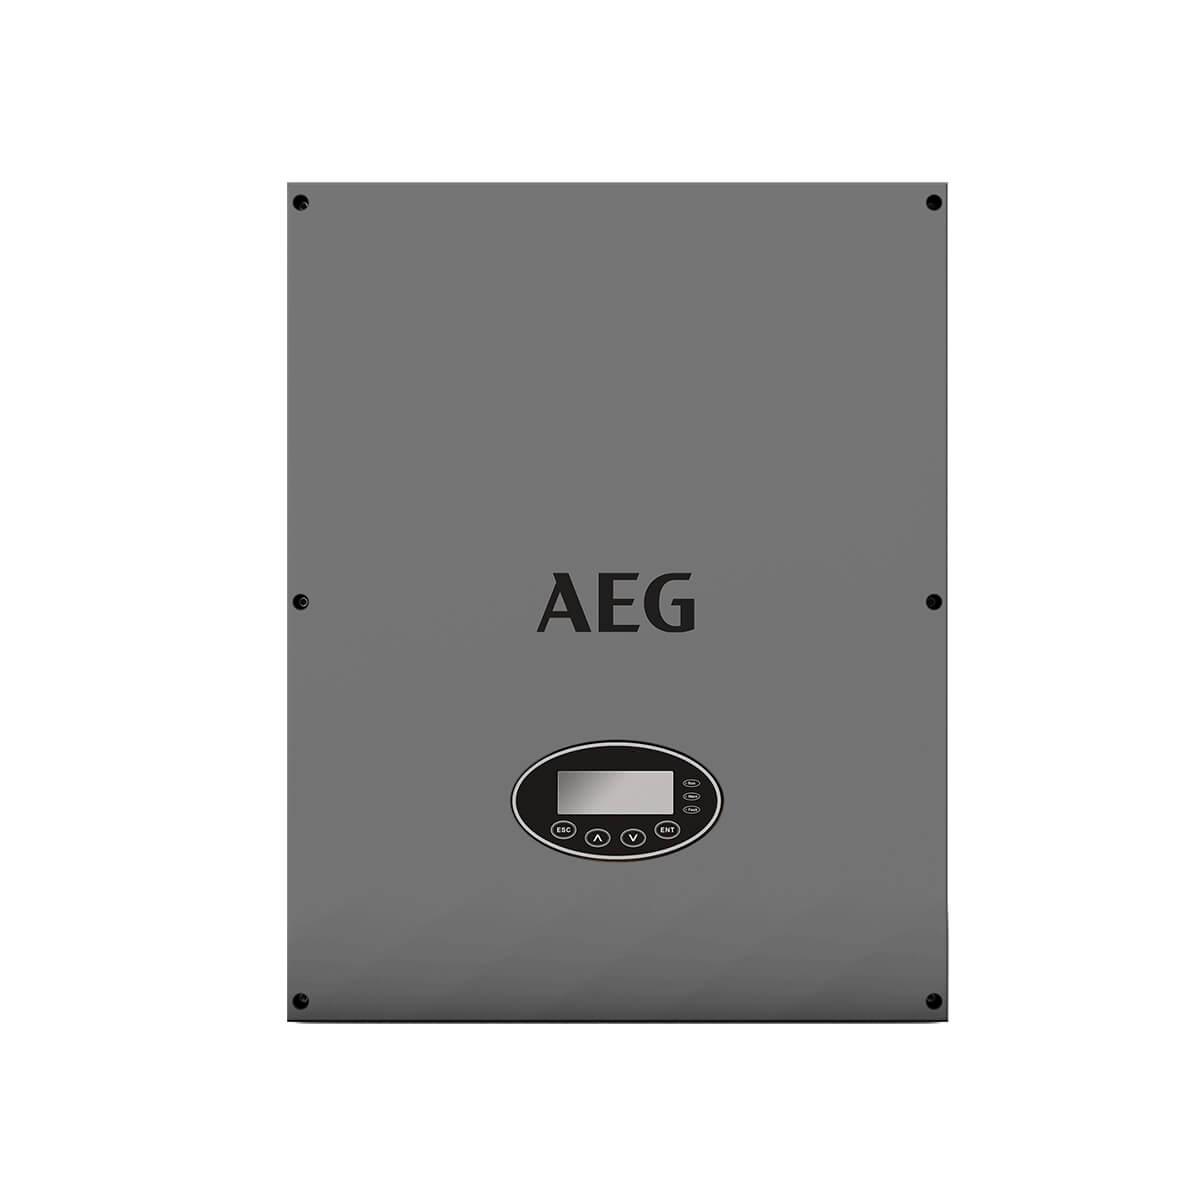 aeg 12kW inverter, aeg as-ic01 12kW inverter, aeg as-ic01-12000-2 inverter, aeg as-ic01-12000-2, aeg as-ic01 12kW, AEG 12 KW